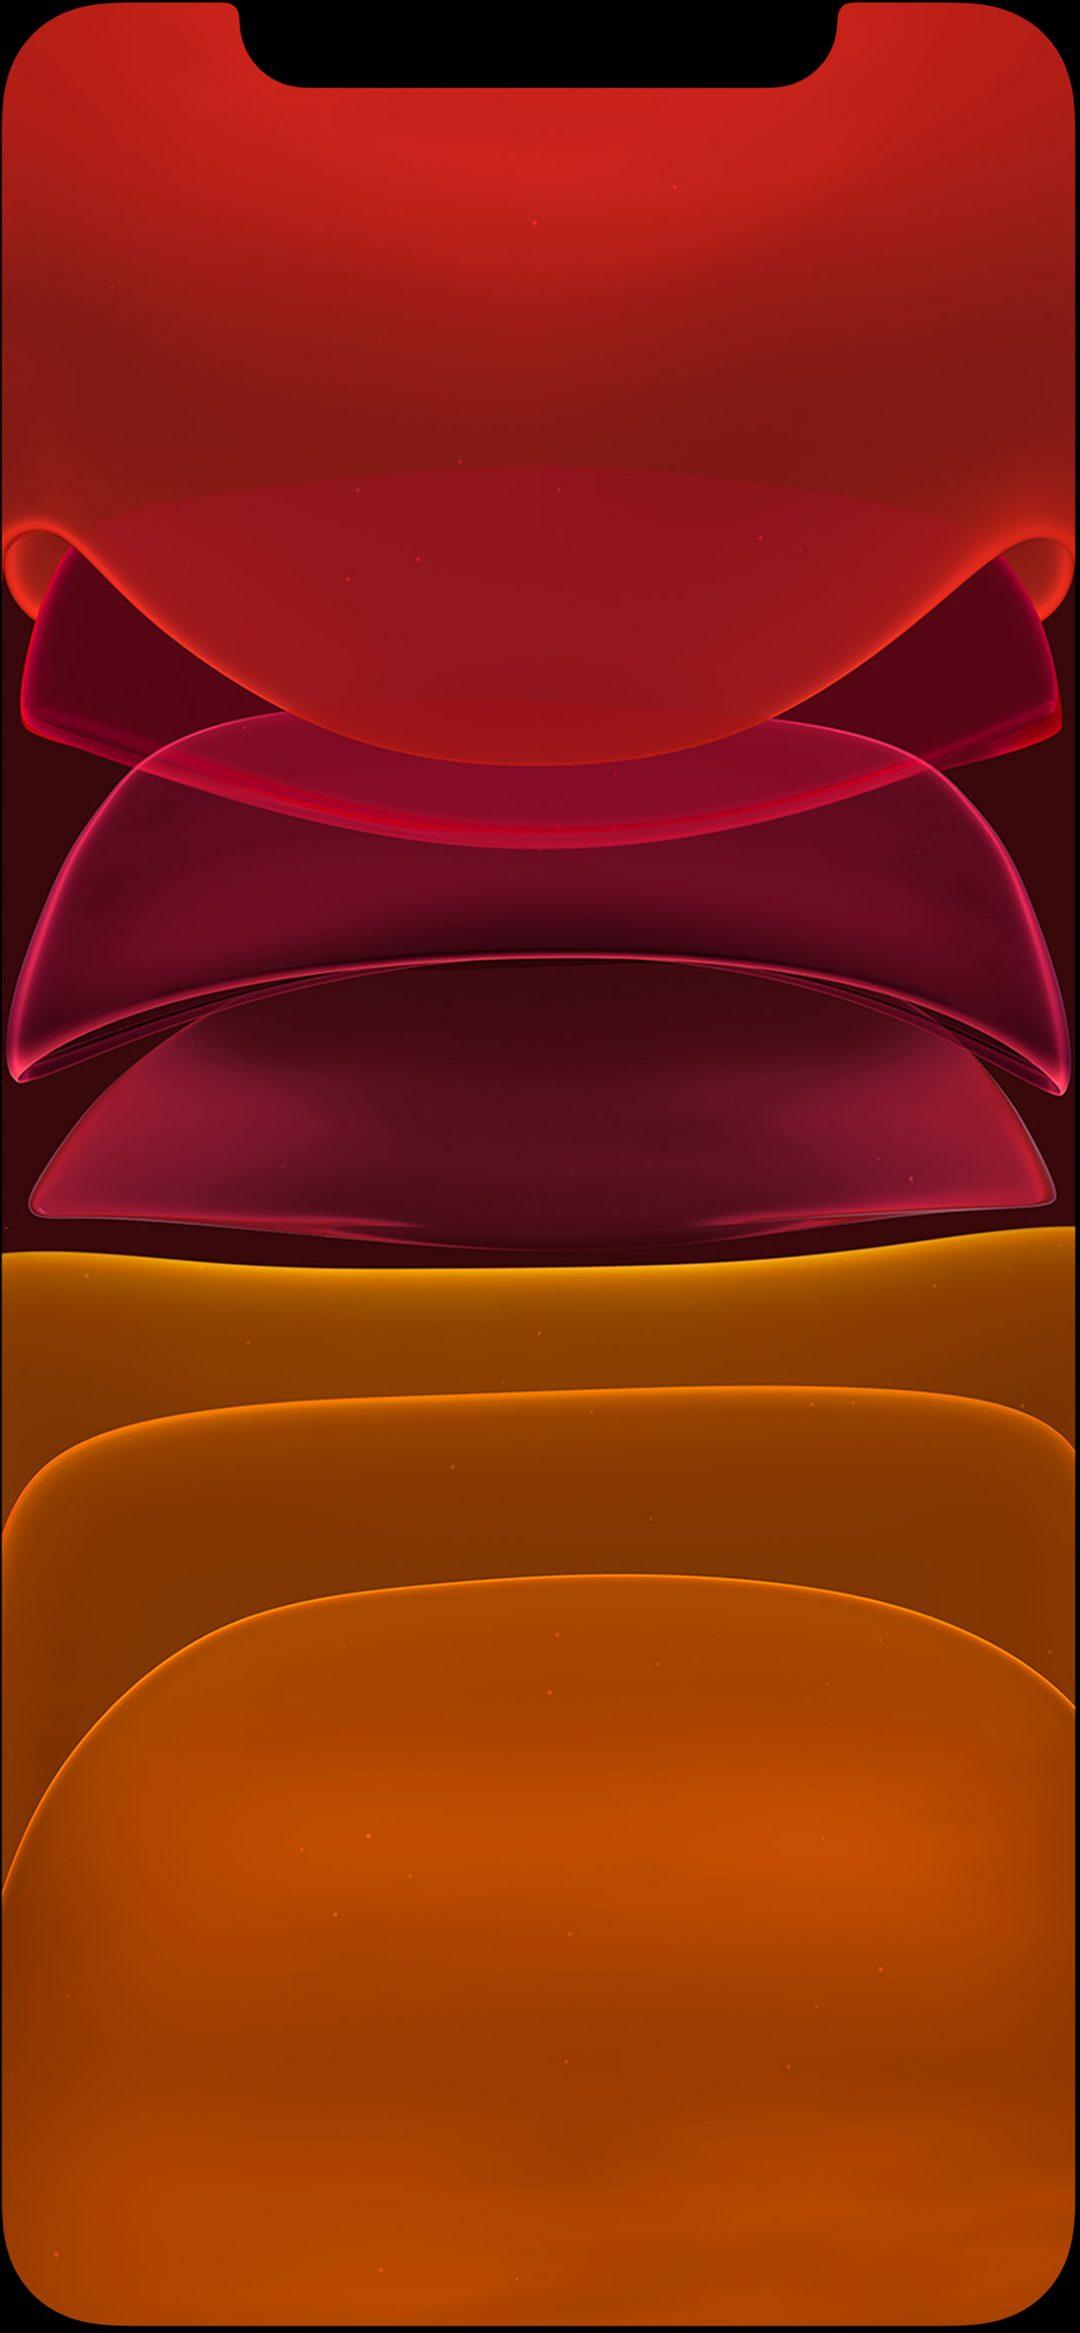 iphone-11-default-wallpaper-ardroiding-12